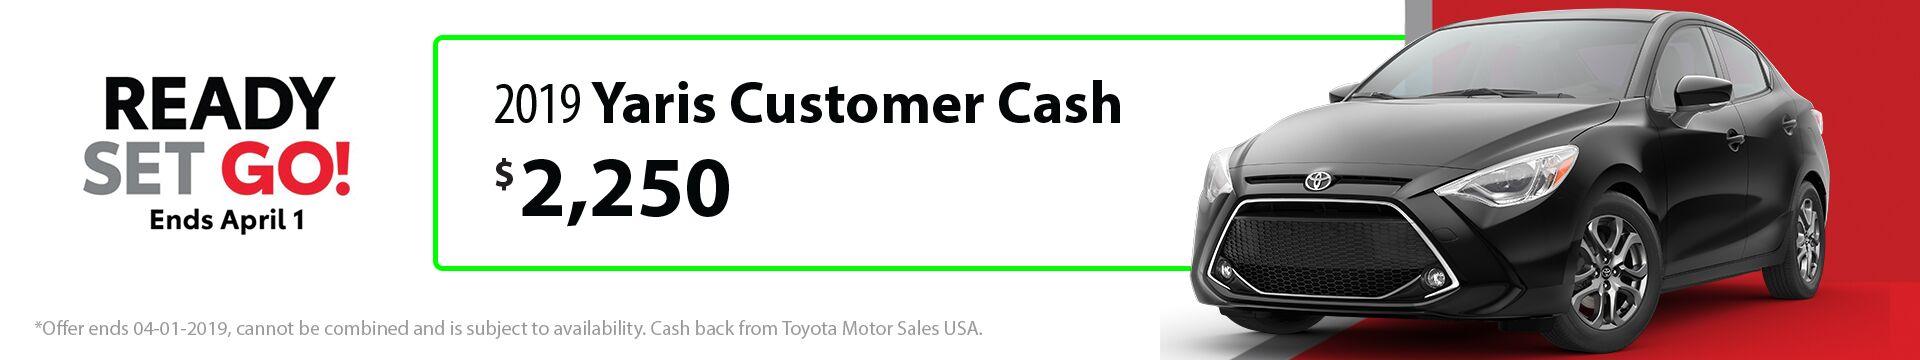 2019 Yaris Customer Cash